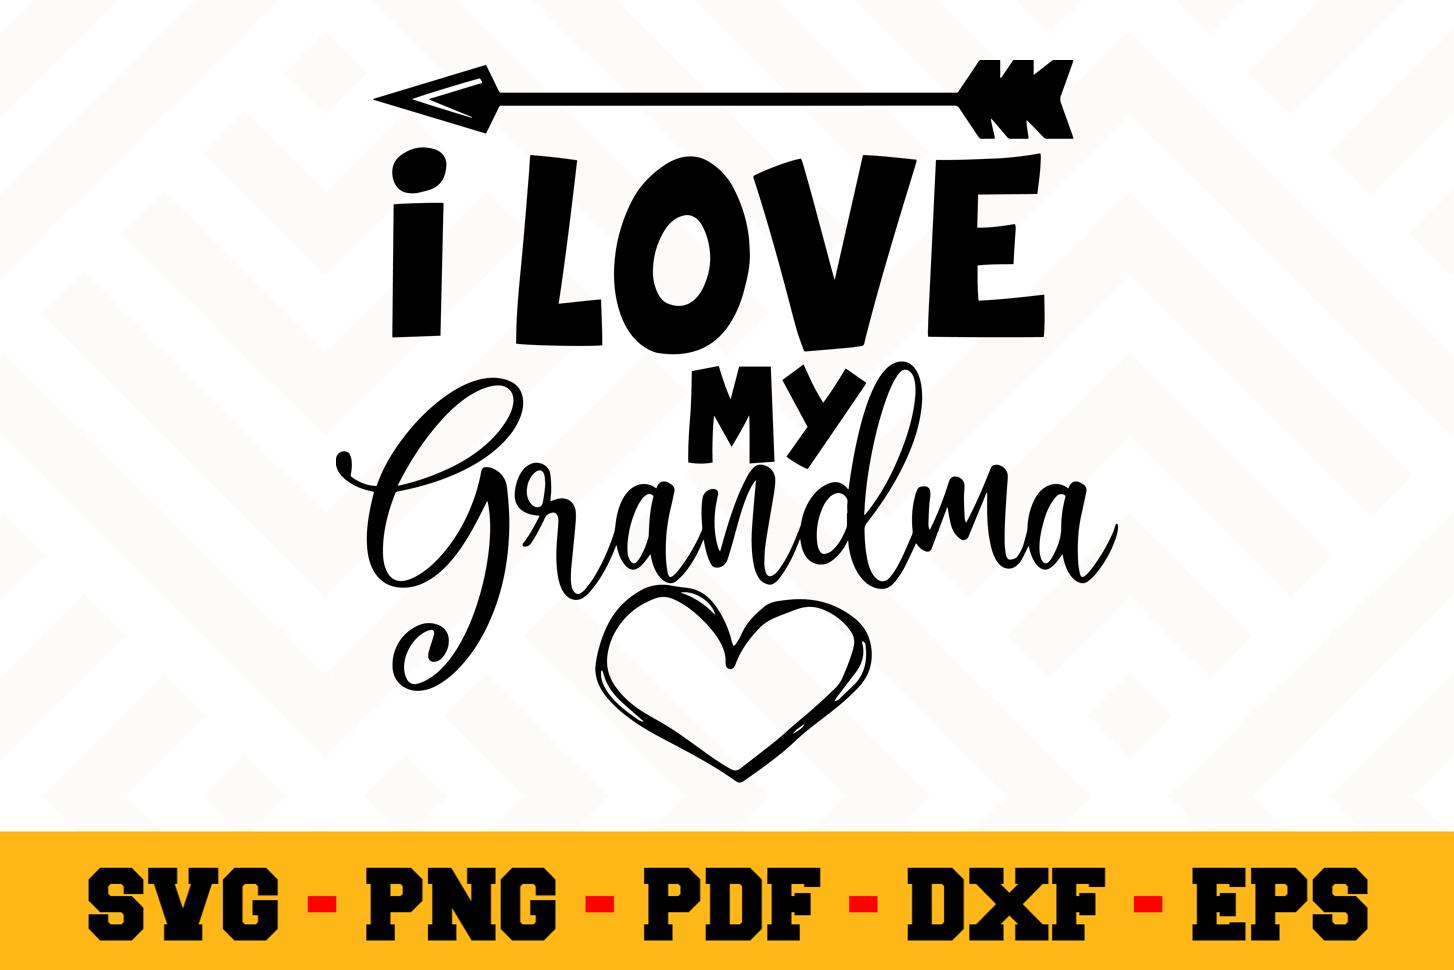 Grandma clipart love grandma, Grandma love grandma.